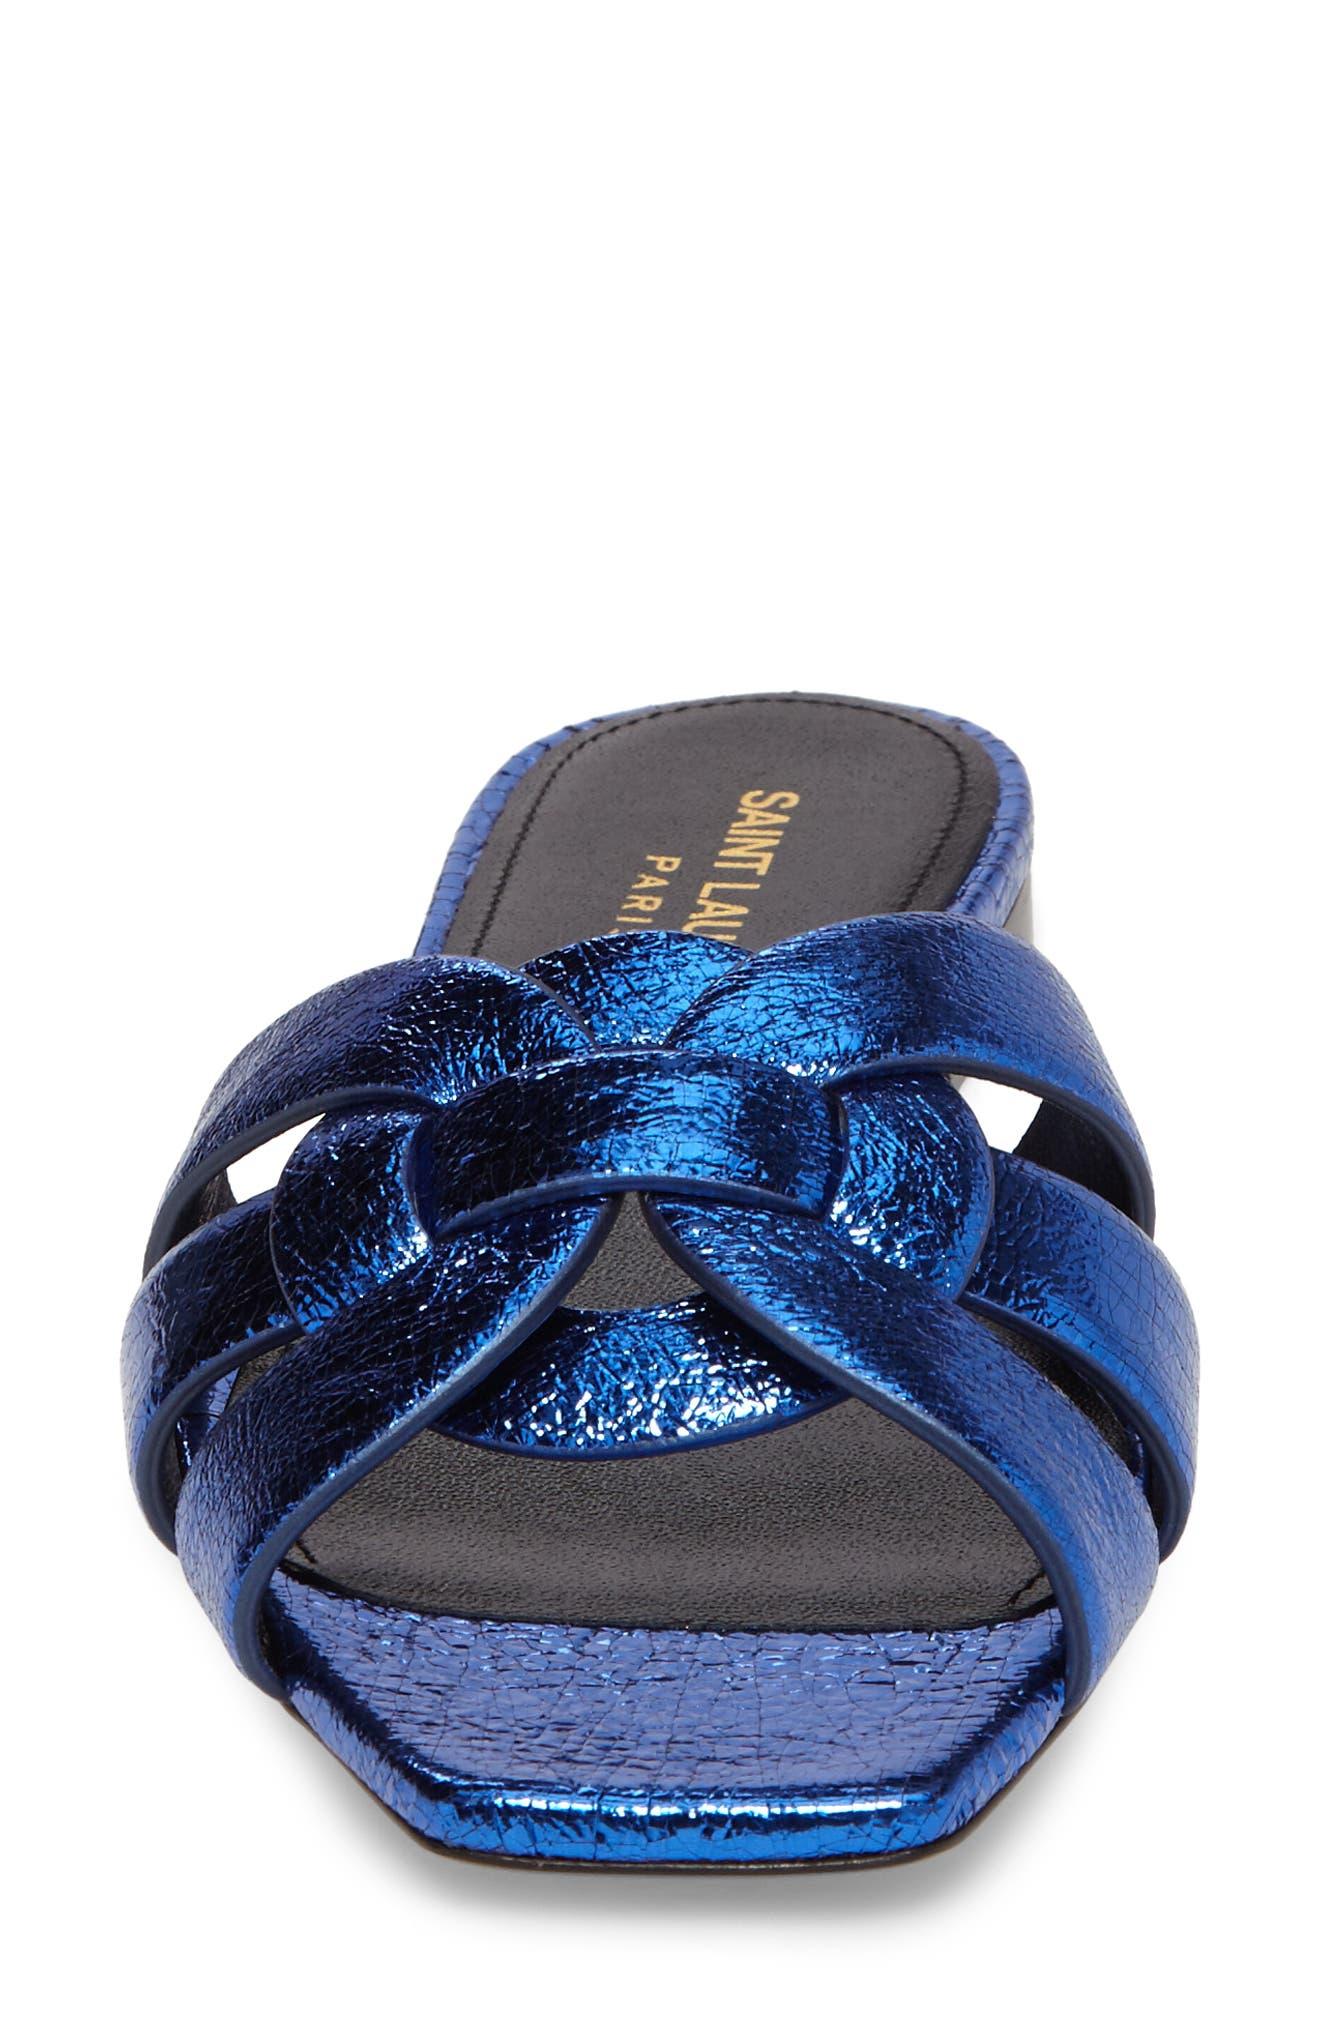 Pieds Metallic Slide Sandal,                             Alternate thumbnail 4, color,                             Blue Metal